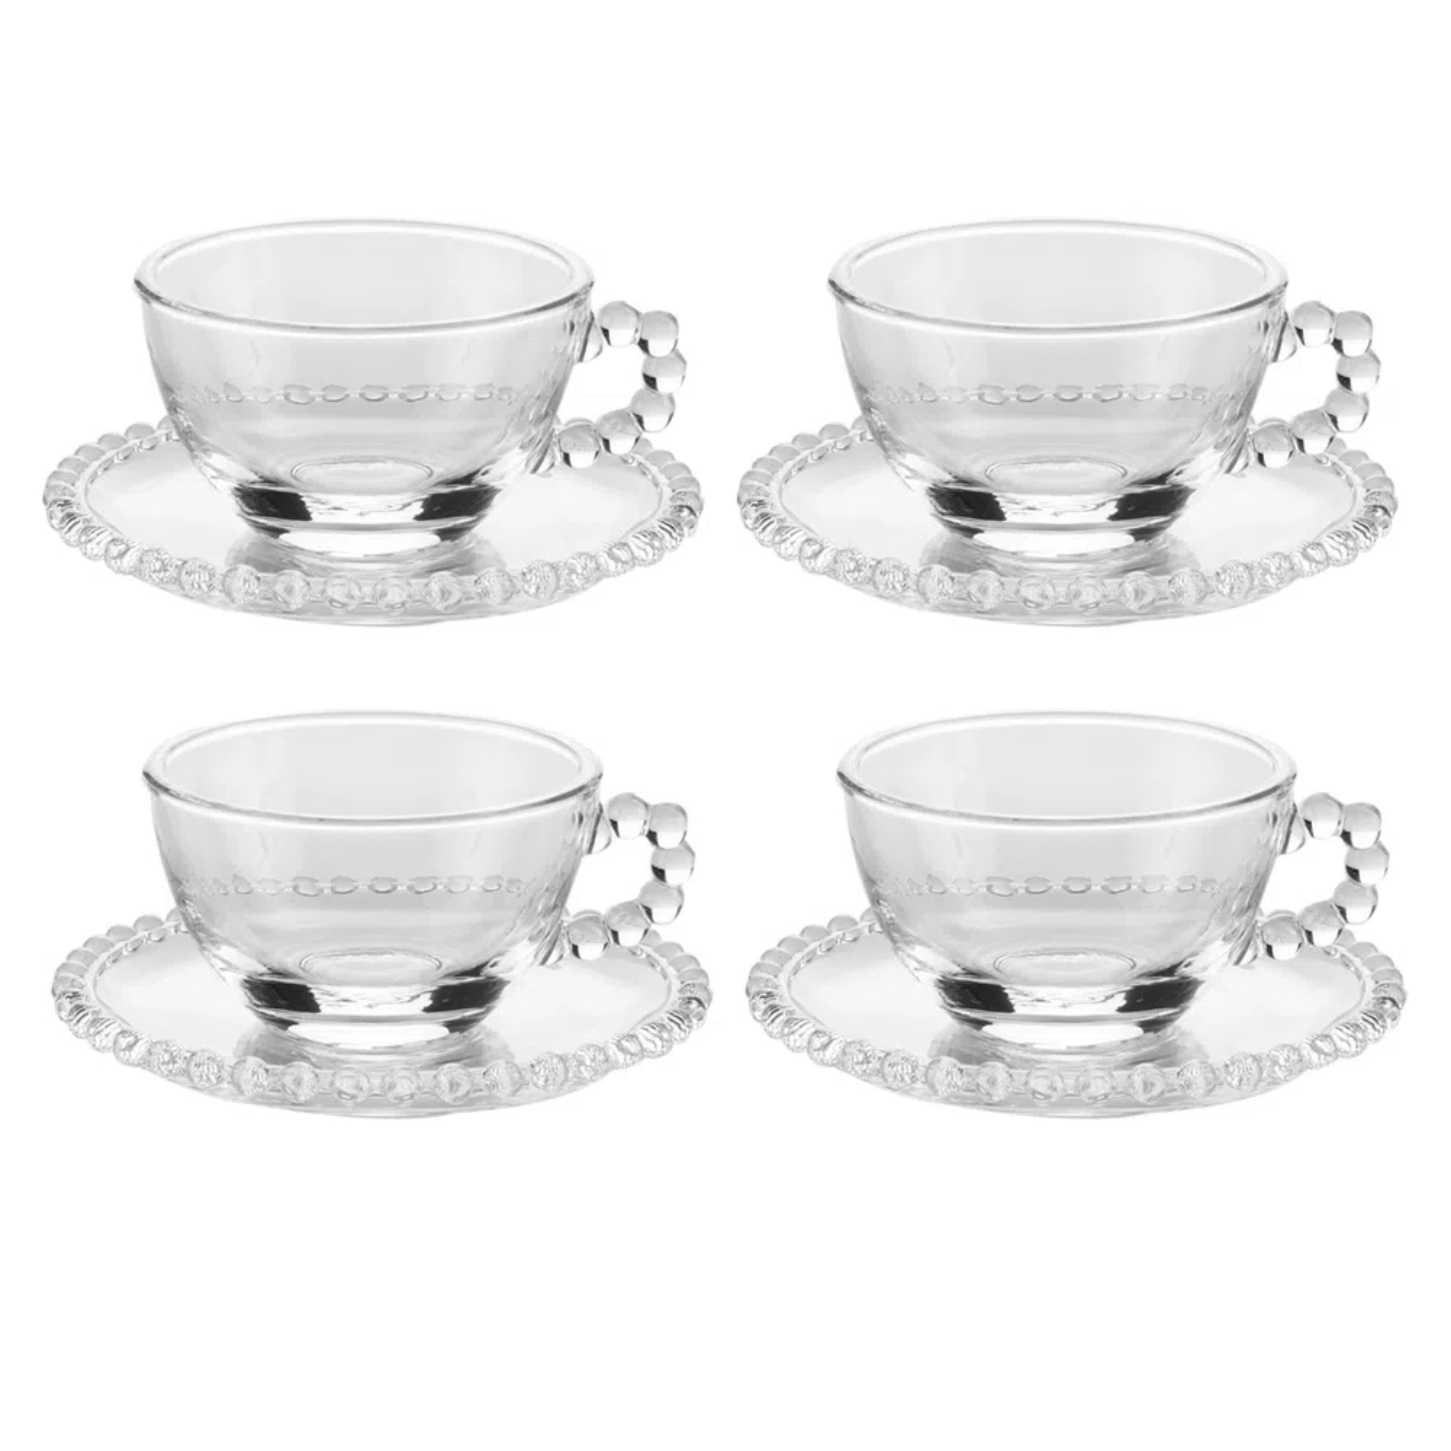 Conjunto de 4 Xícaras de Chá com Pires de Cristal Pearl 200ml - Wolff